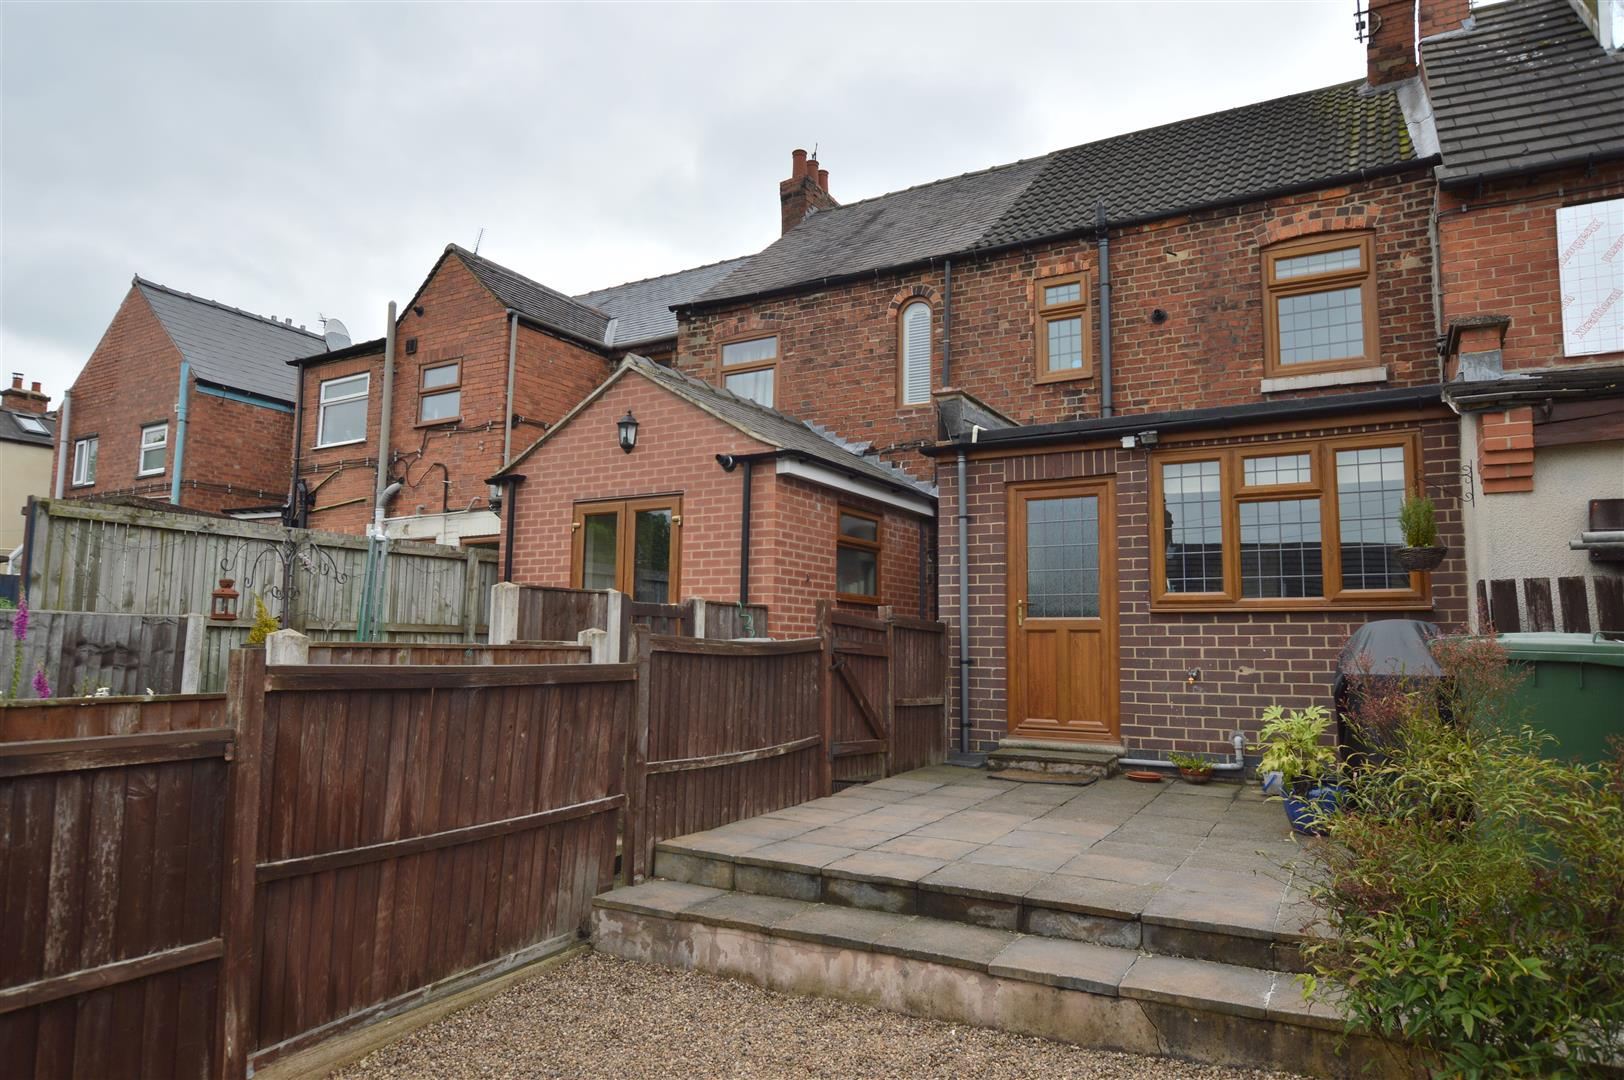 2 Bedroom Terraced House For Sale In Belper